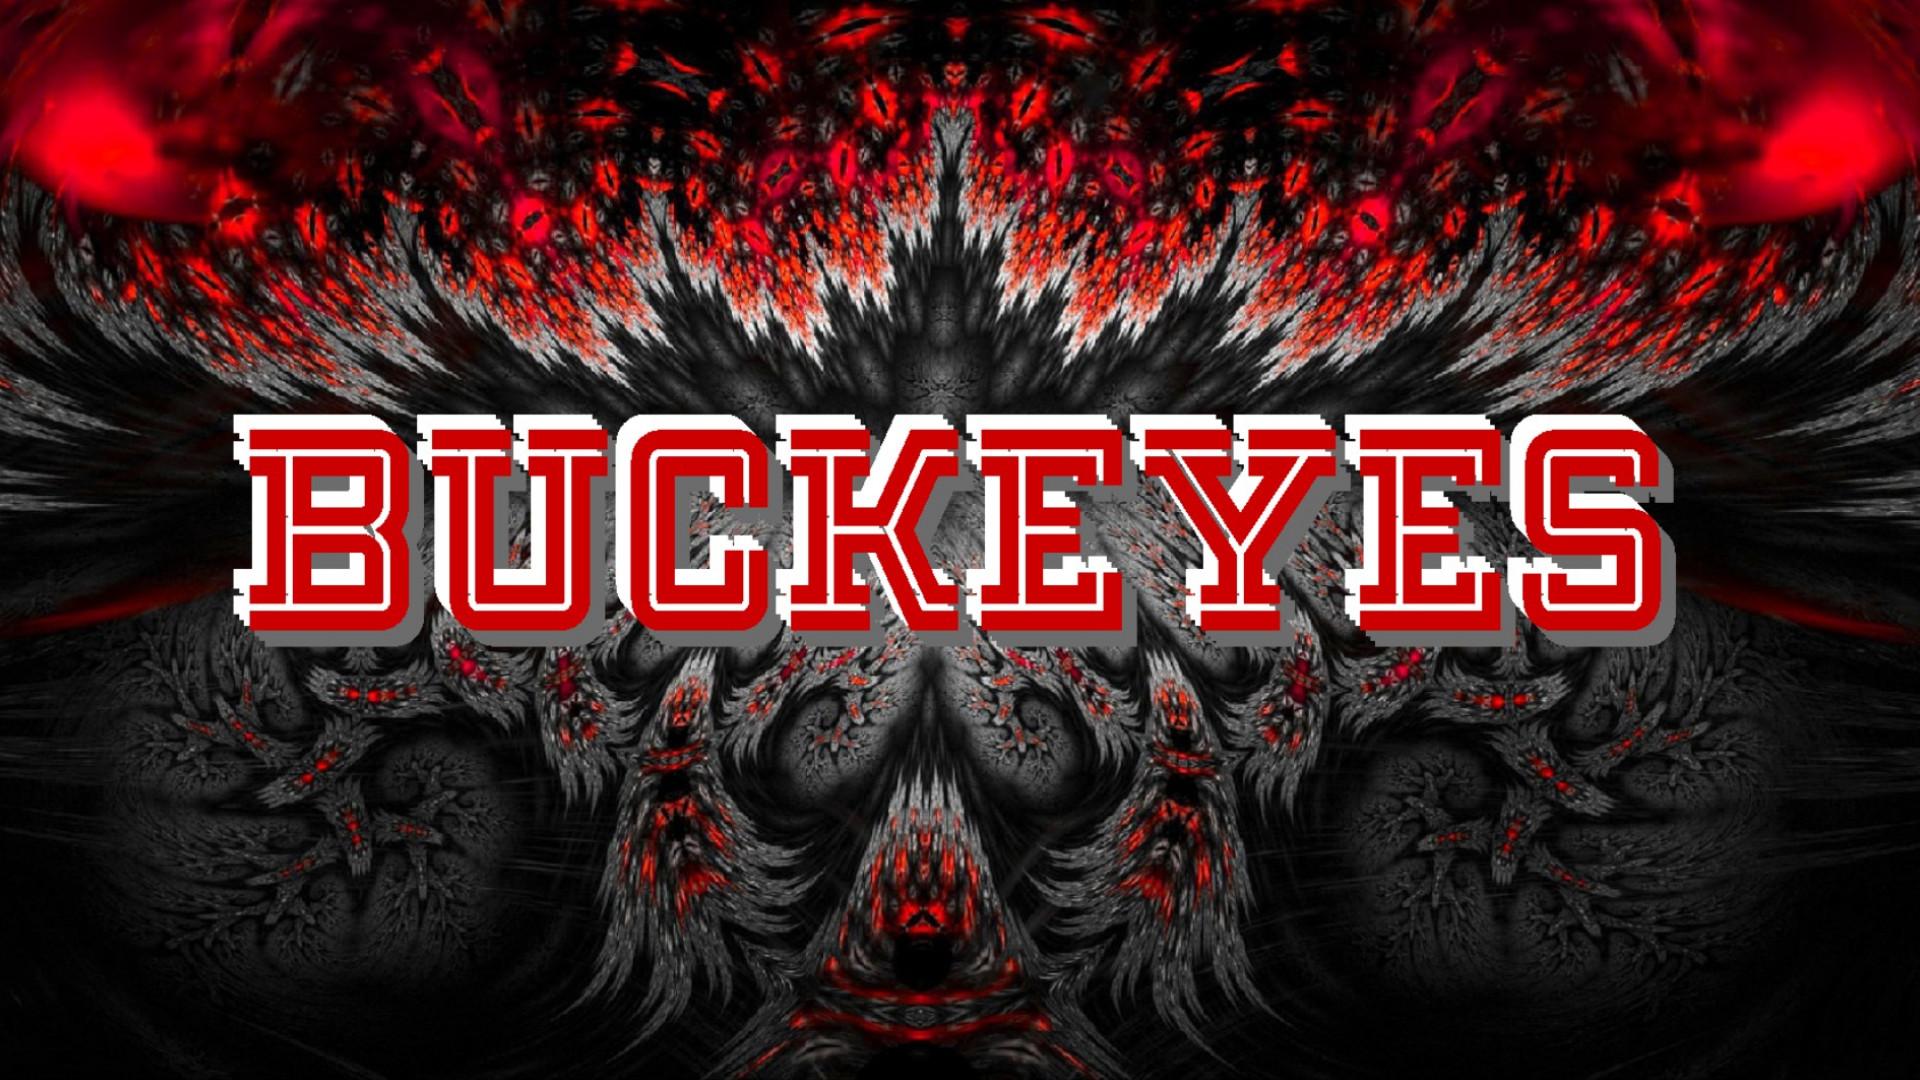 BUCKEYES-ON-AN-ABSTRACT-ohio-state-buckeyes-30548079-